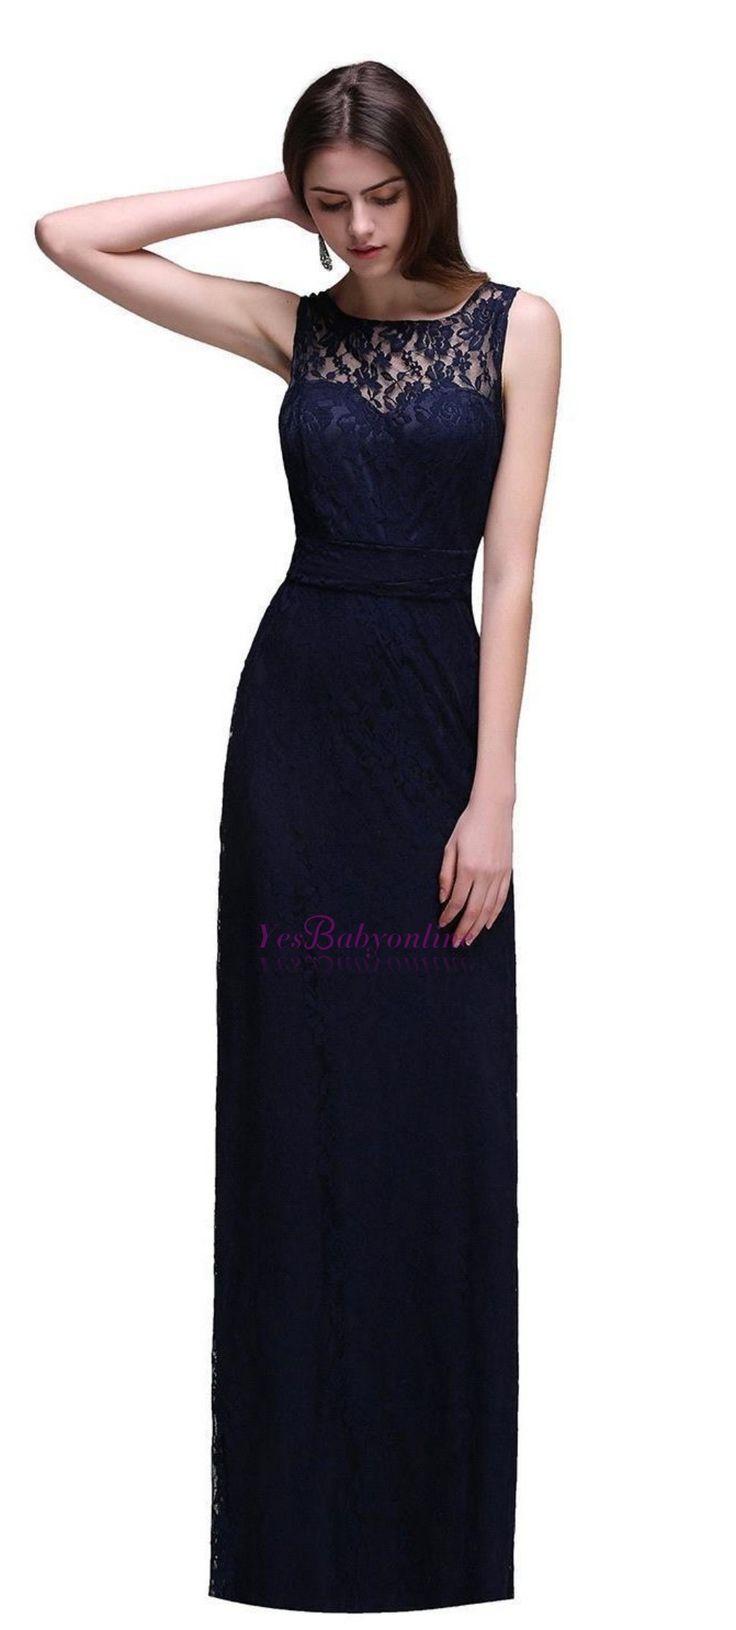 Best 25+ Navy lace bridesmaid dress ideas on Pinterest